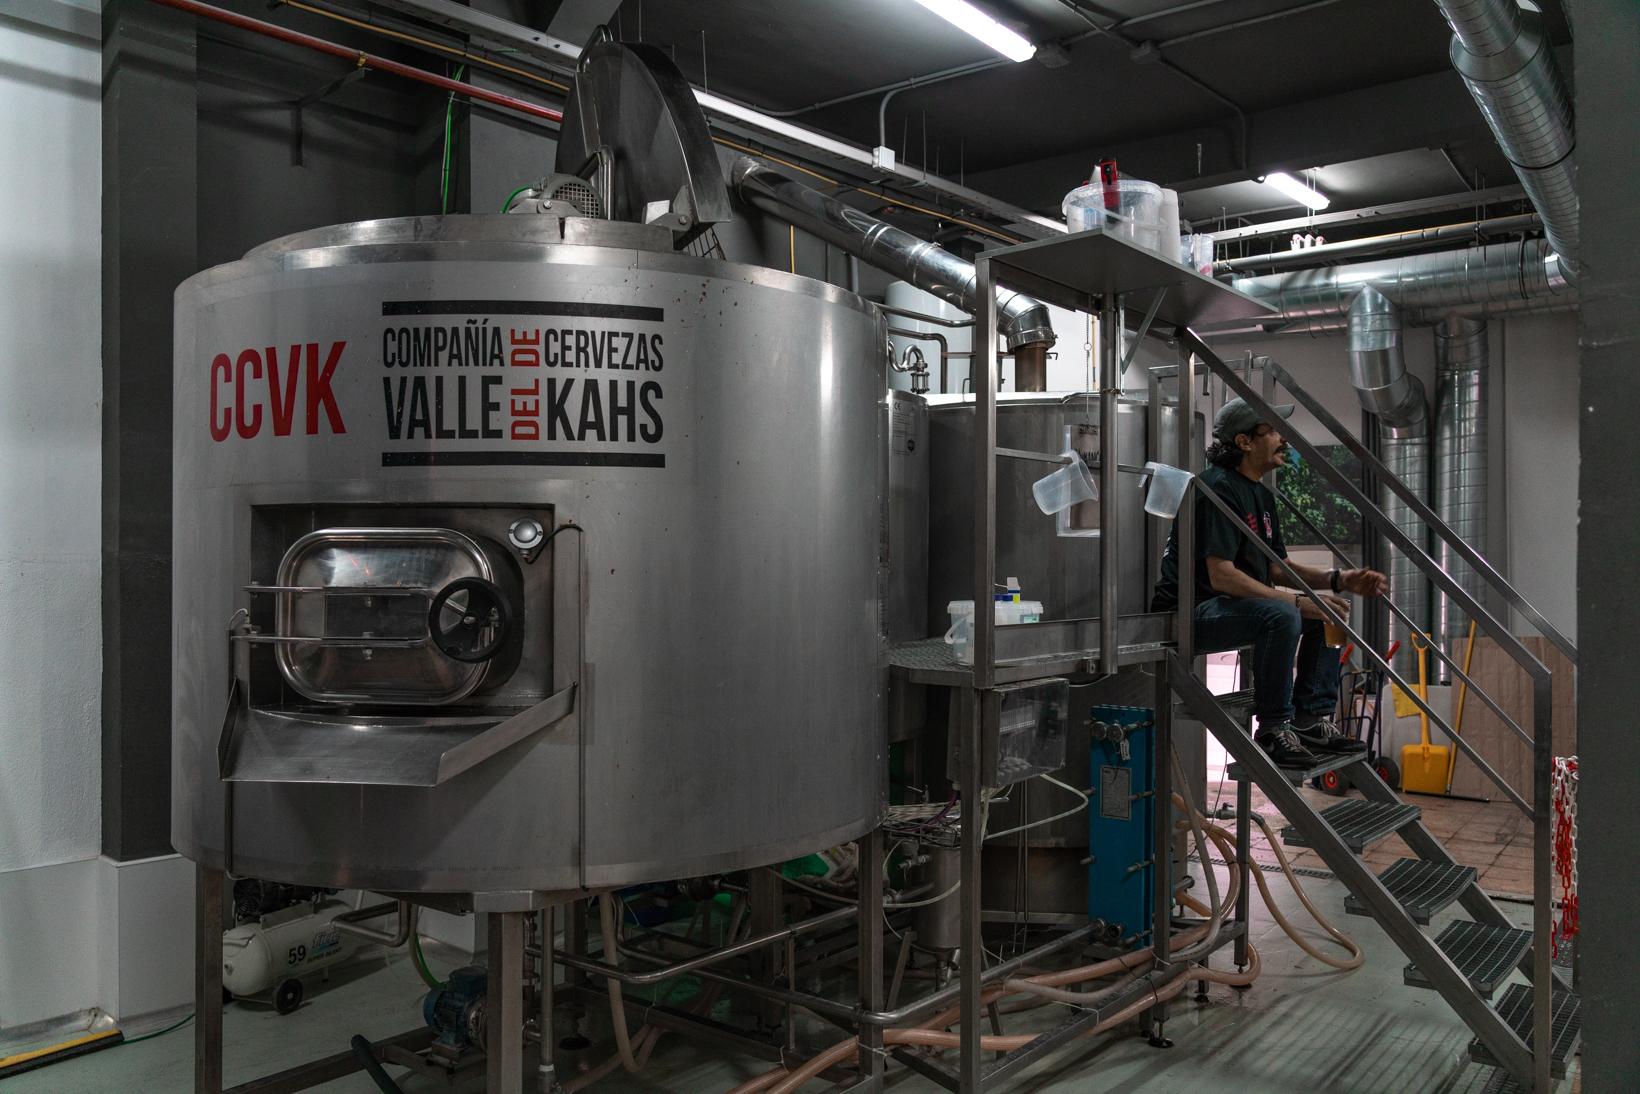 Compañía de Cervezas Valle del Kahs